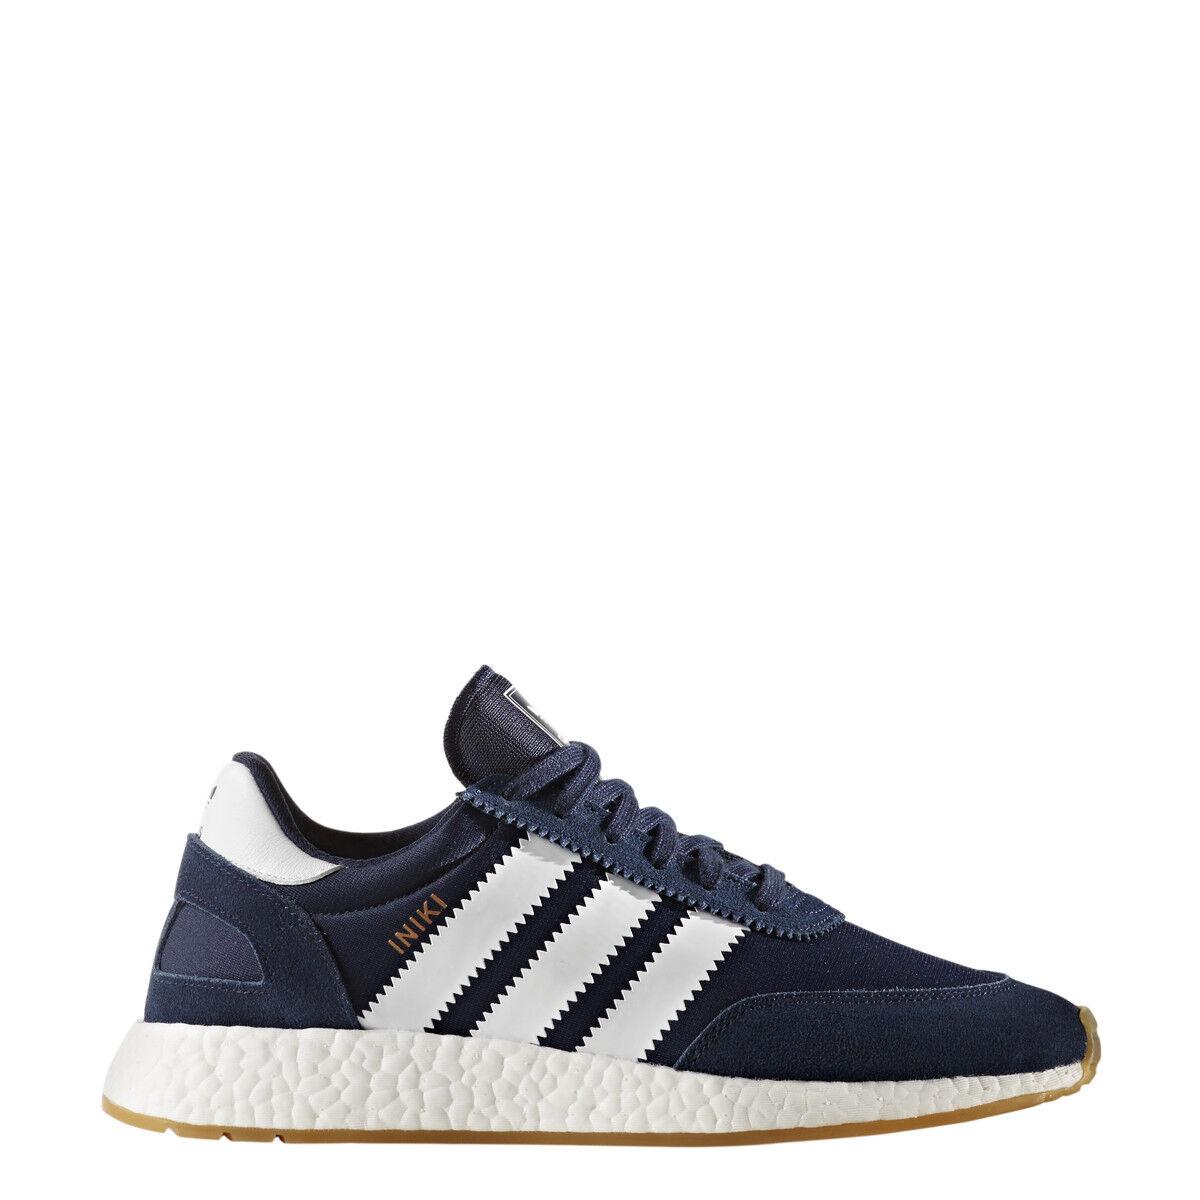 Adidas Mens I-5923 I-5923 I-5923 NVY WHT - BY9729 3dfc6b